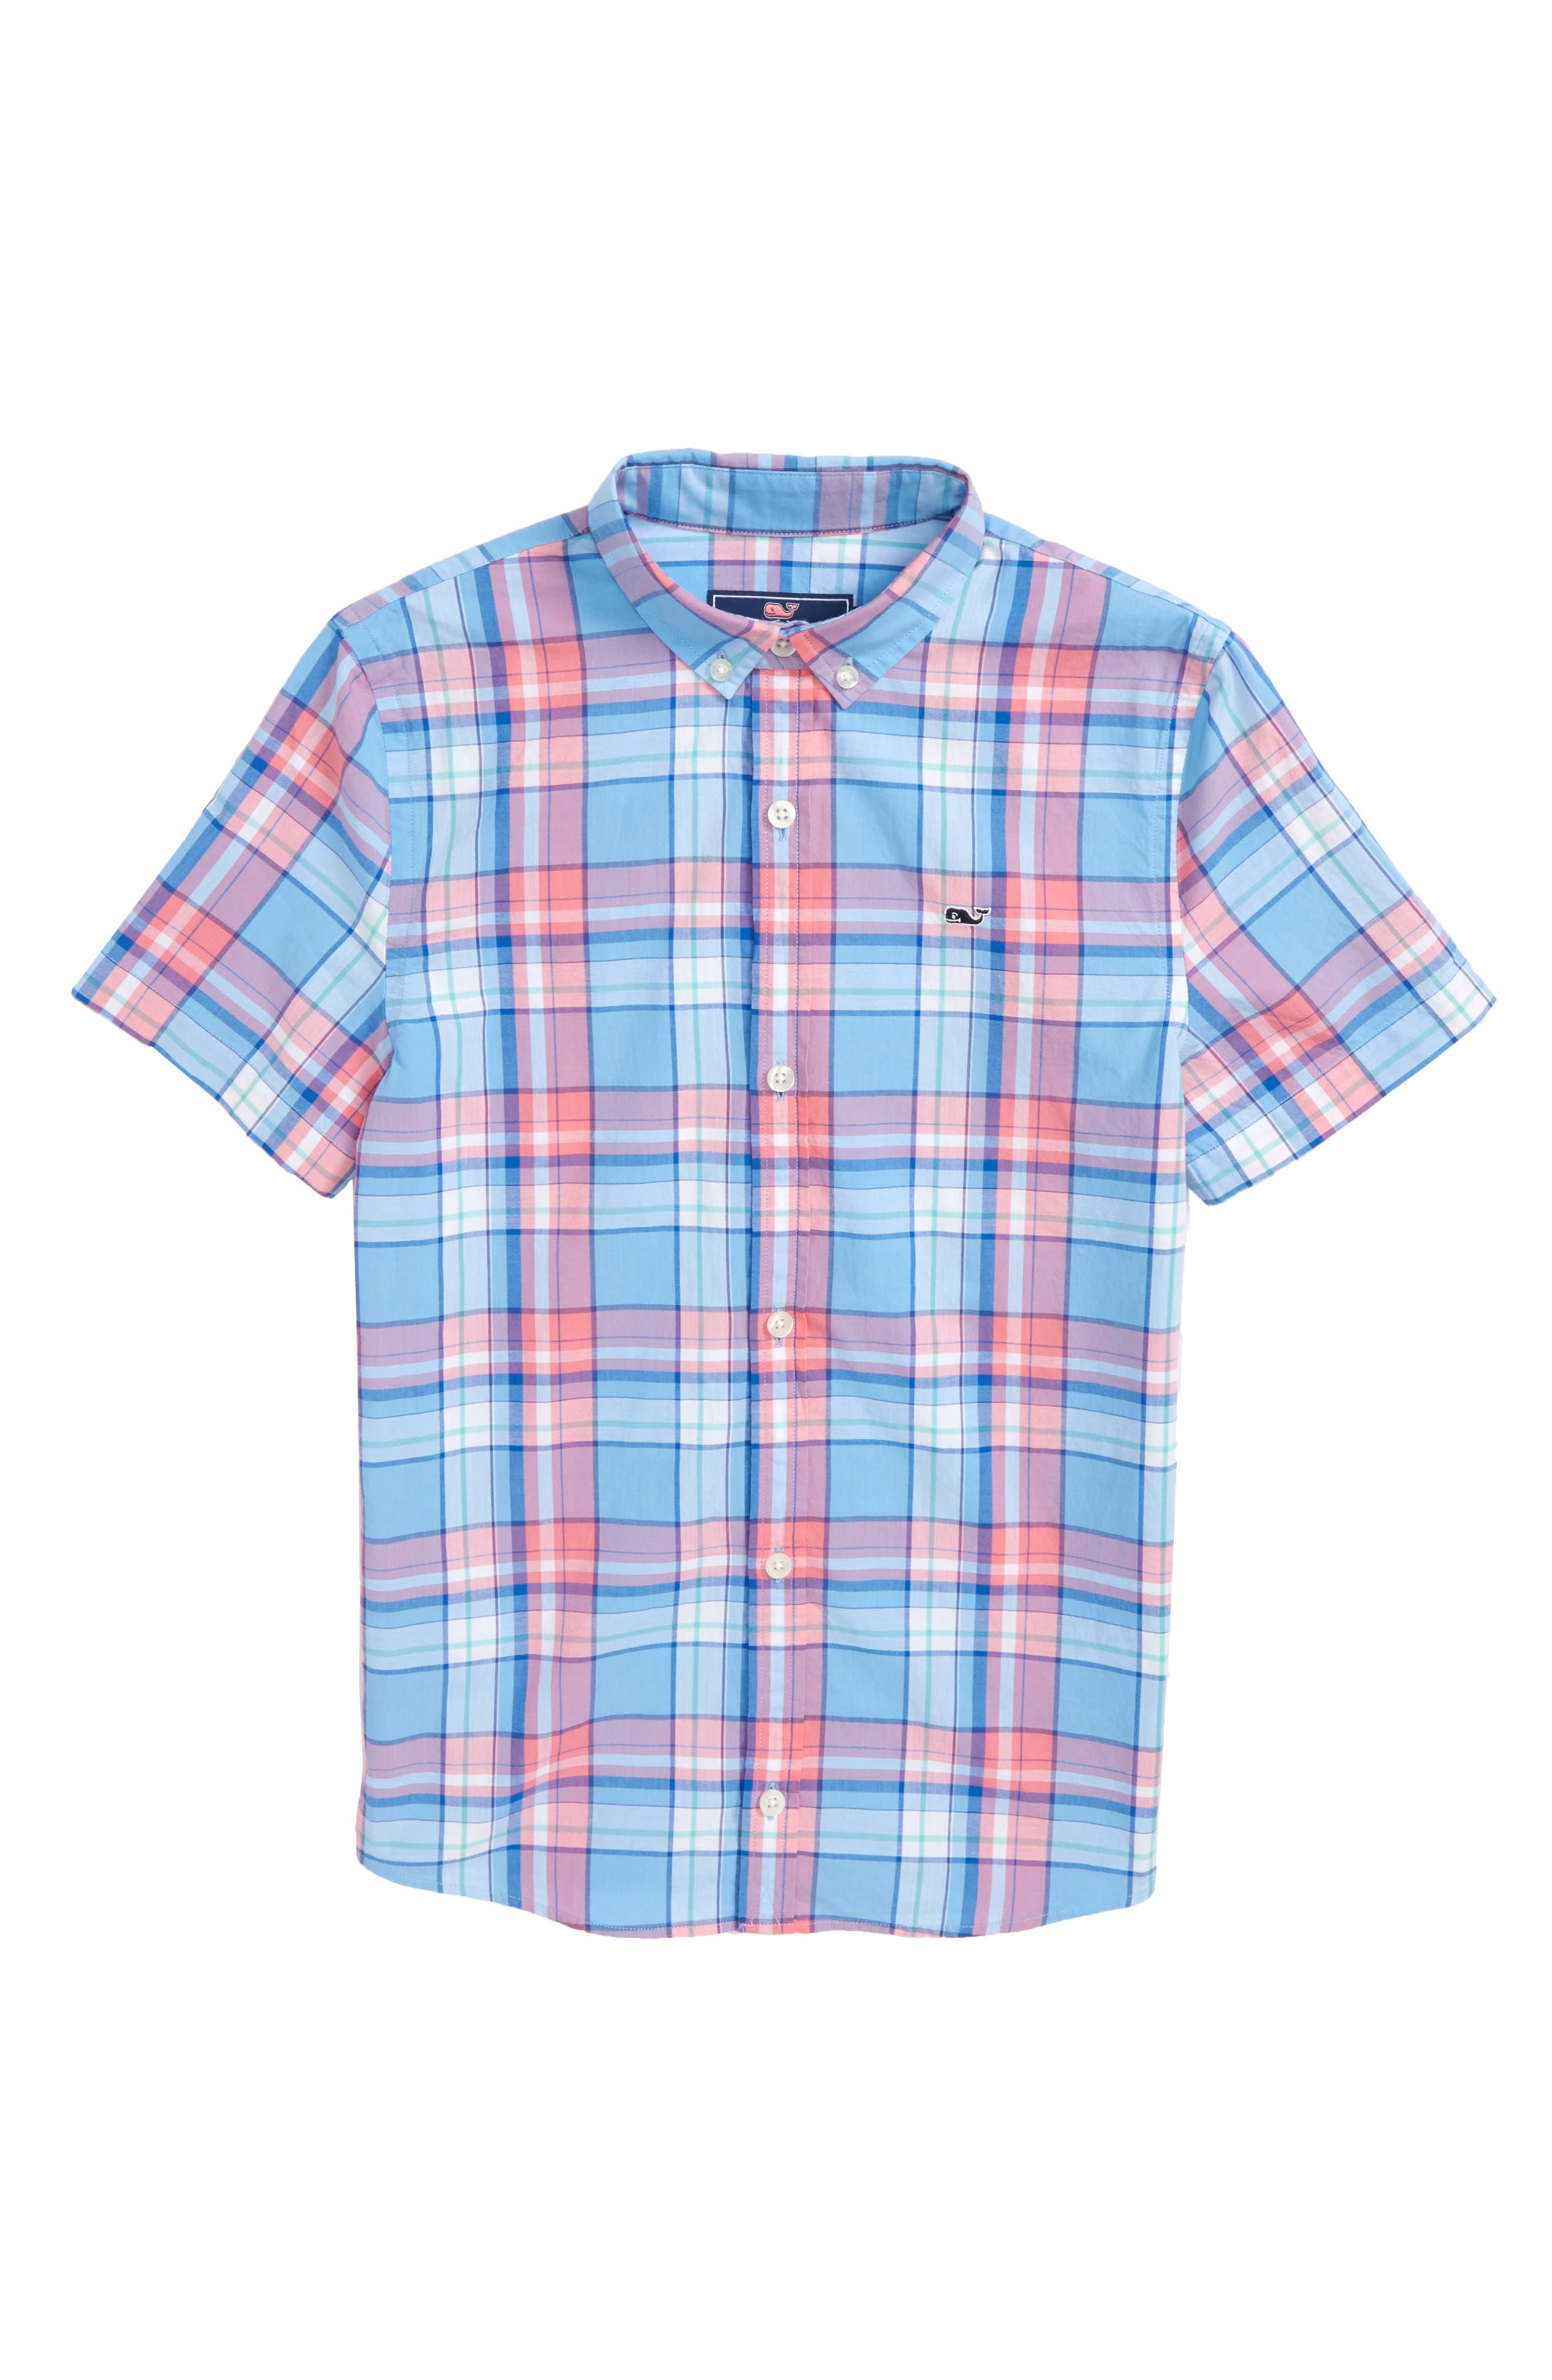 Bluff House Plaid Woven Shirt,                             Main thumbnail 1, color,                             Ocean Breeze